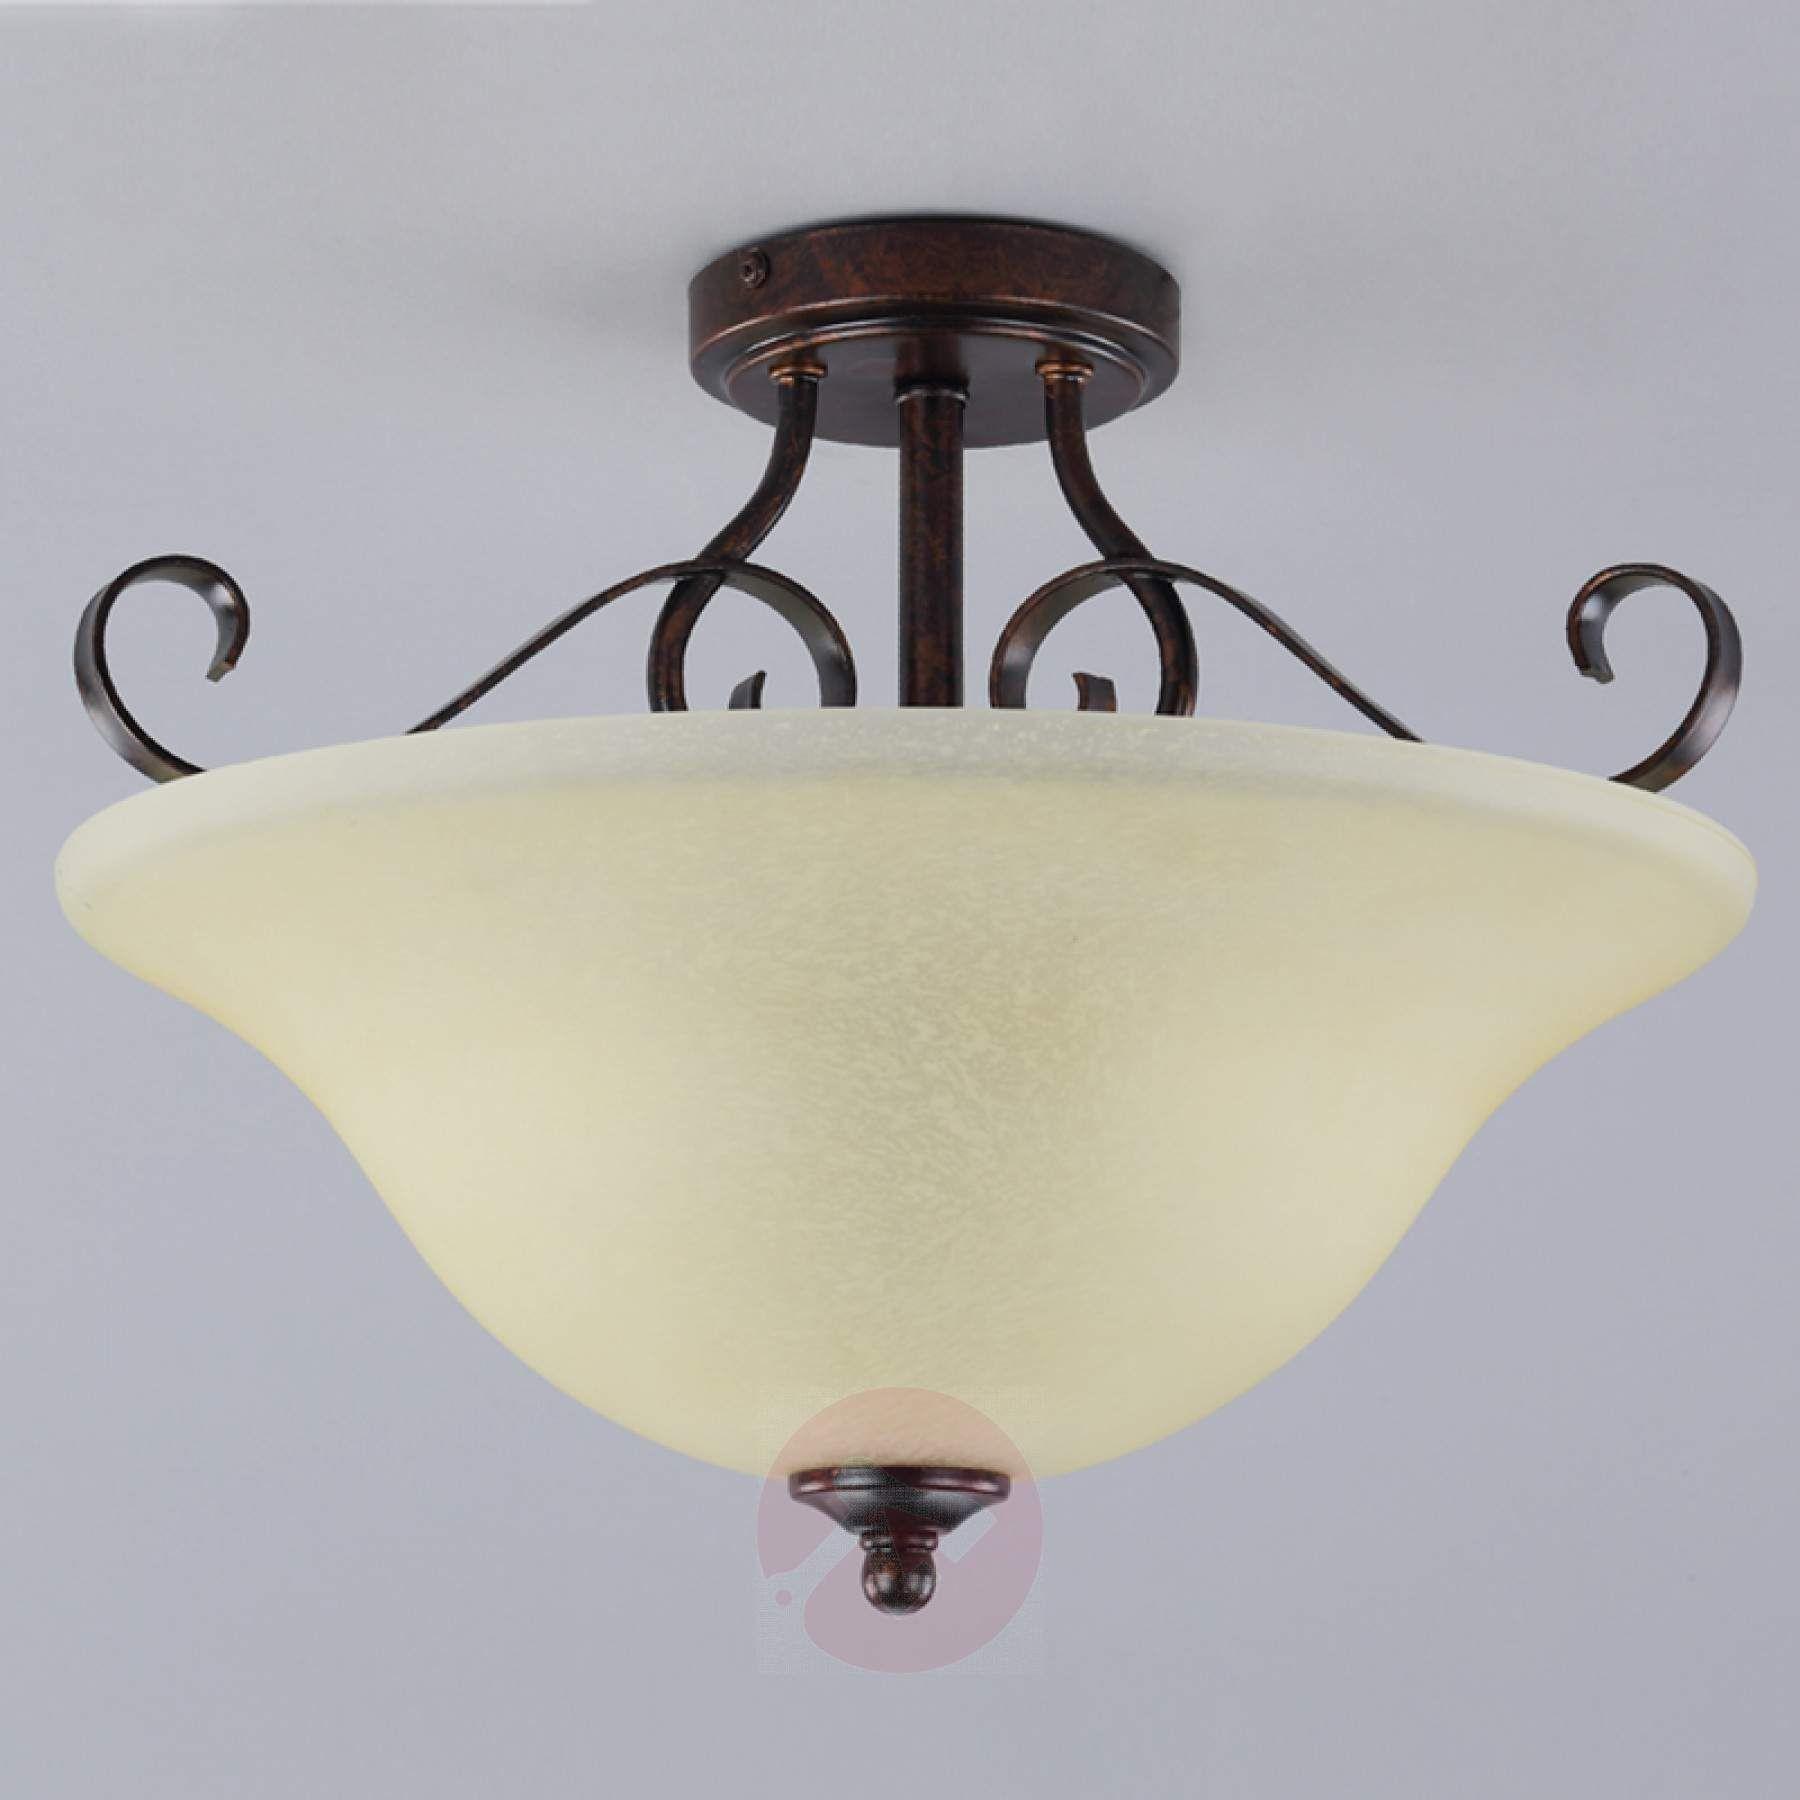 la encantador iluminacion cocina led para encantador lamparas de techo de led 16 gem bezel ring